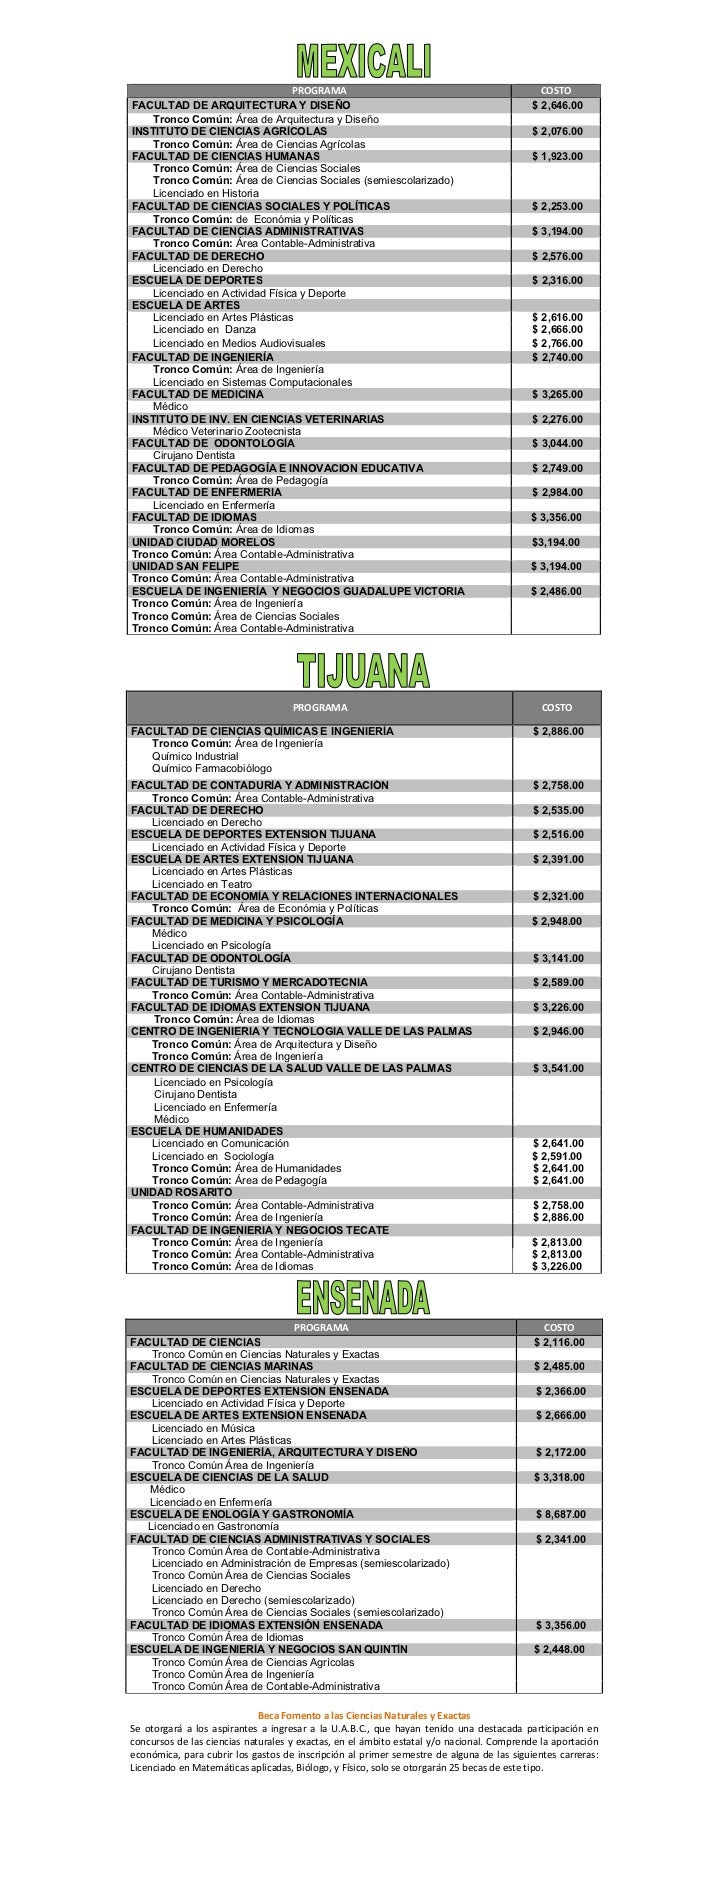 Costos carreras uabc Arquitectura y diseno uabc